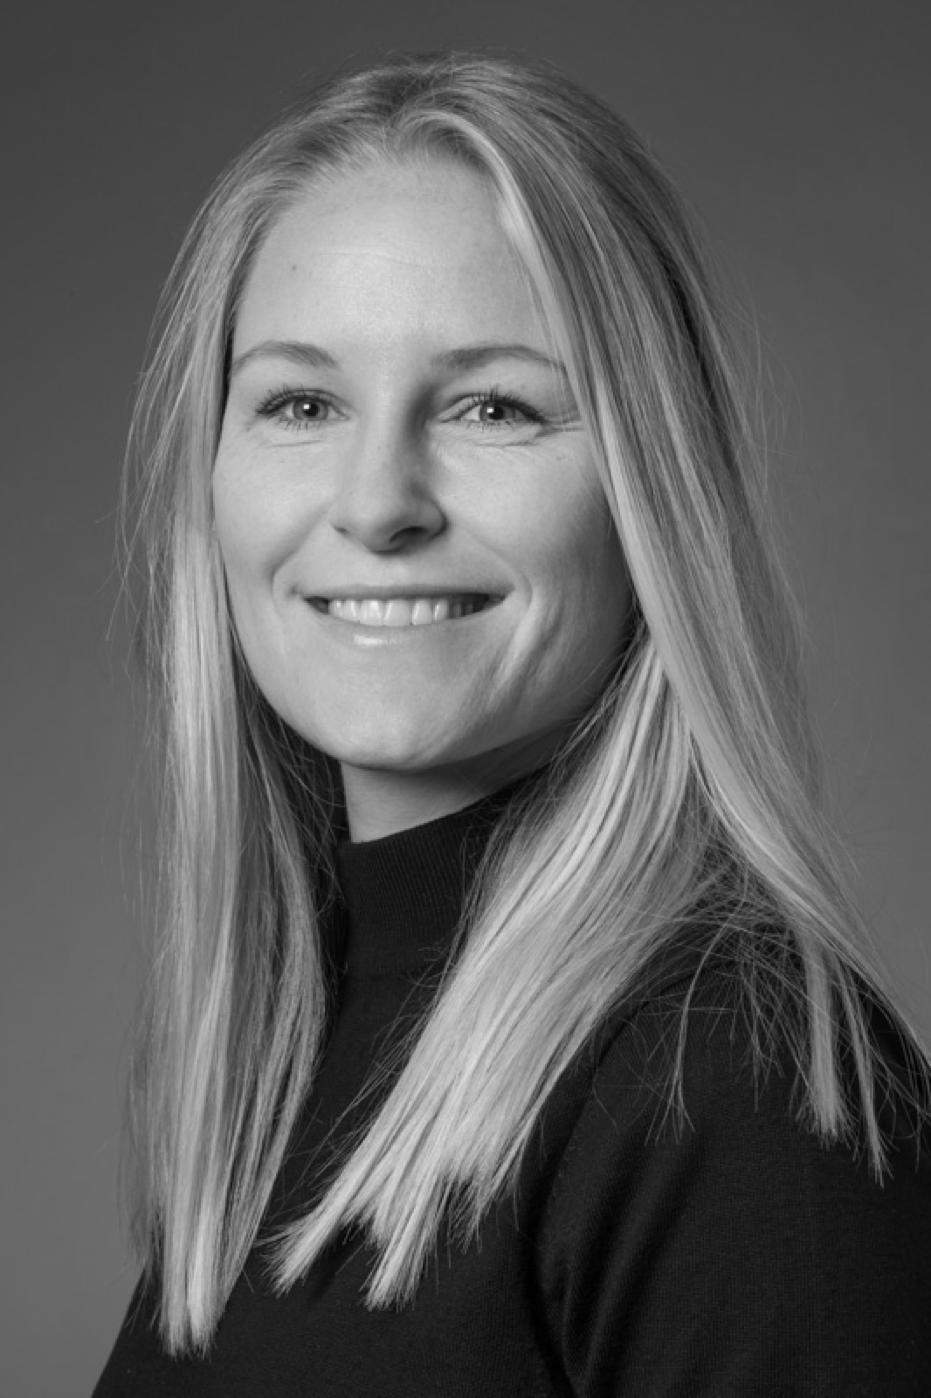 JosefineDalsgaard